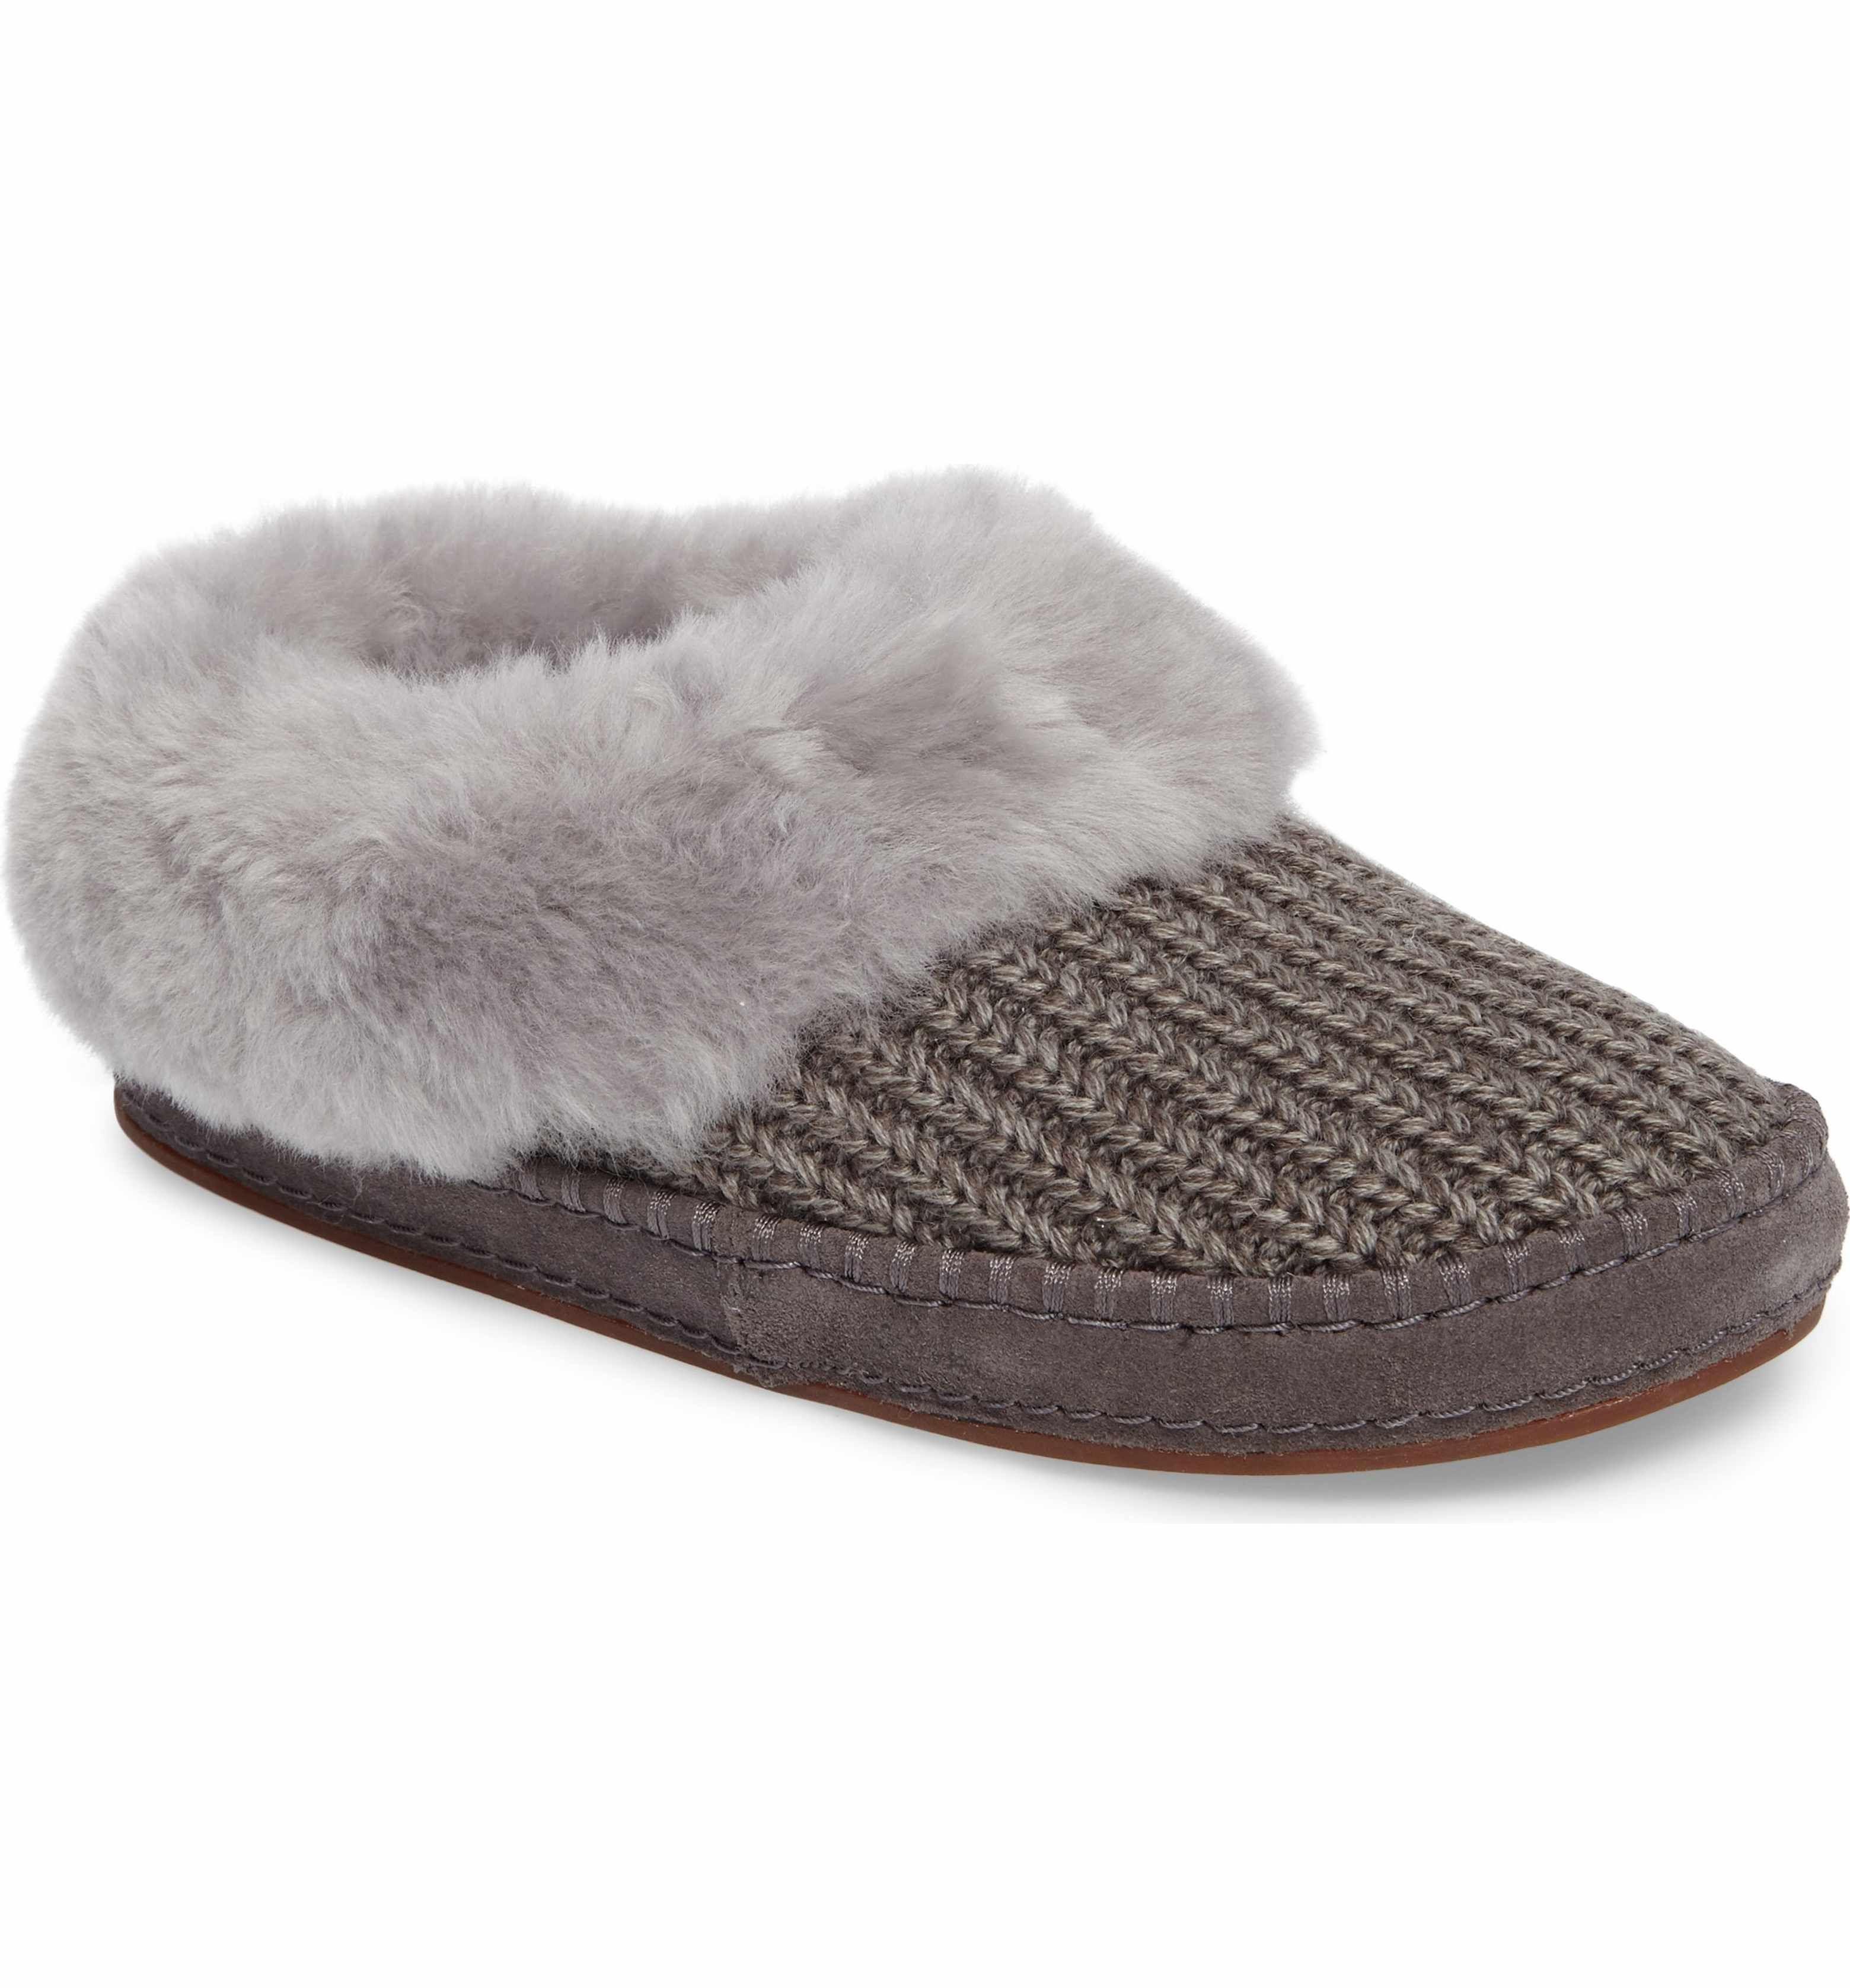 balega comfort review dry socks comforter hidden leave epic run